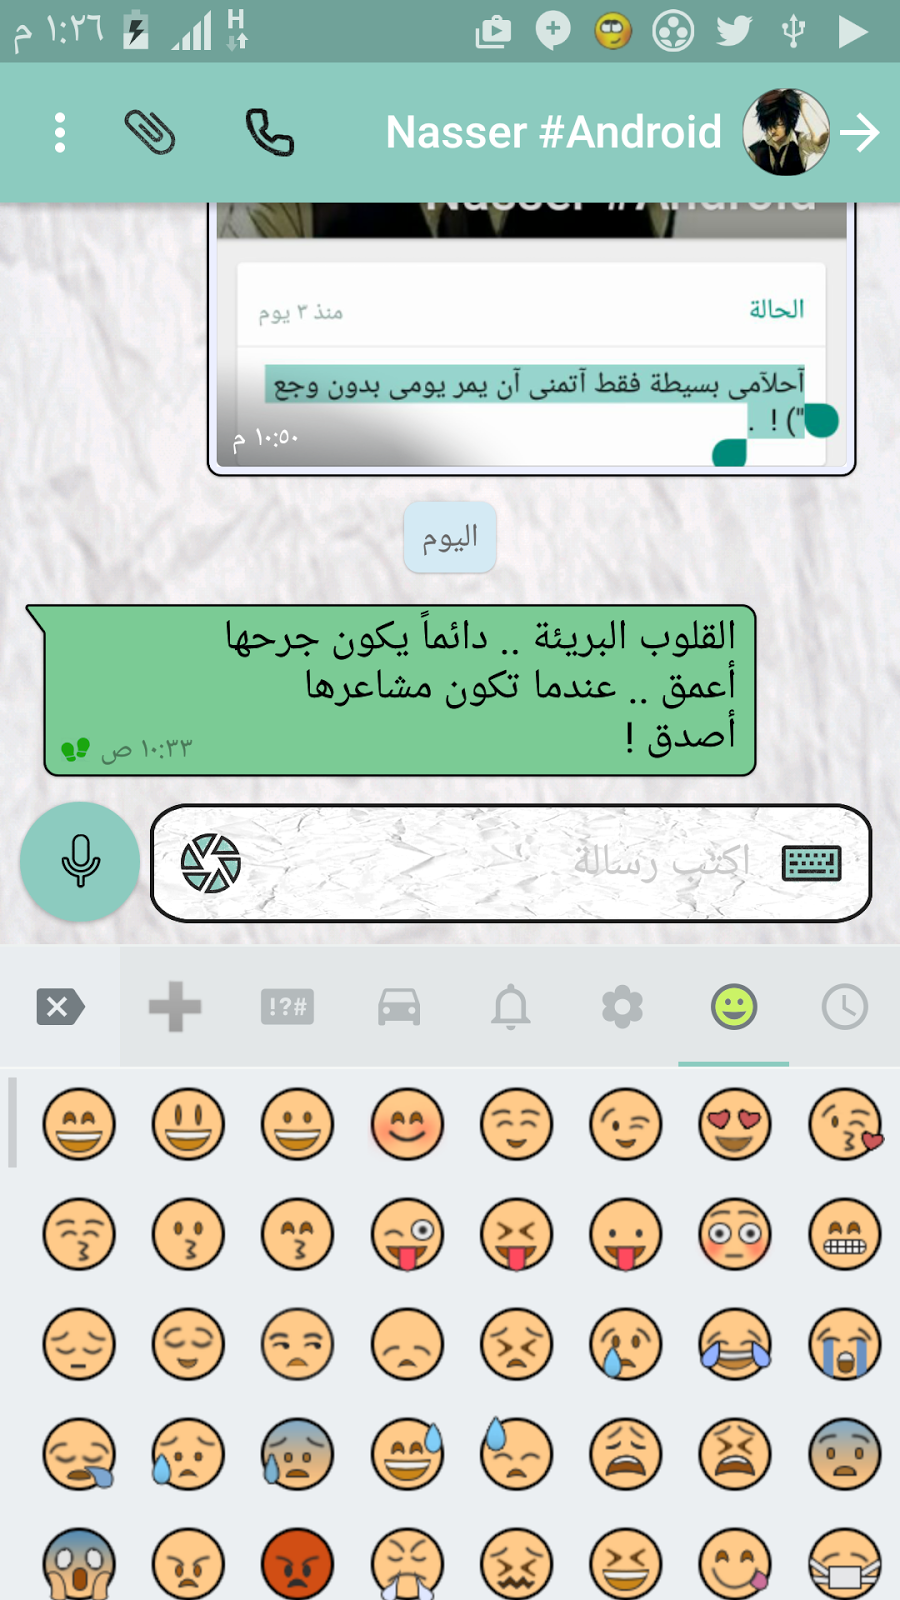 واتساب بثيم الكرتون Whatsupp V5 03 التورنيدو برامج موقعك App Periodic Table Android